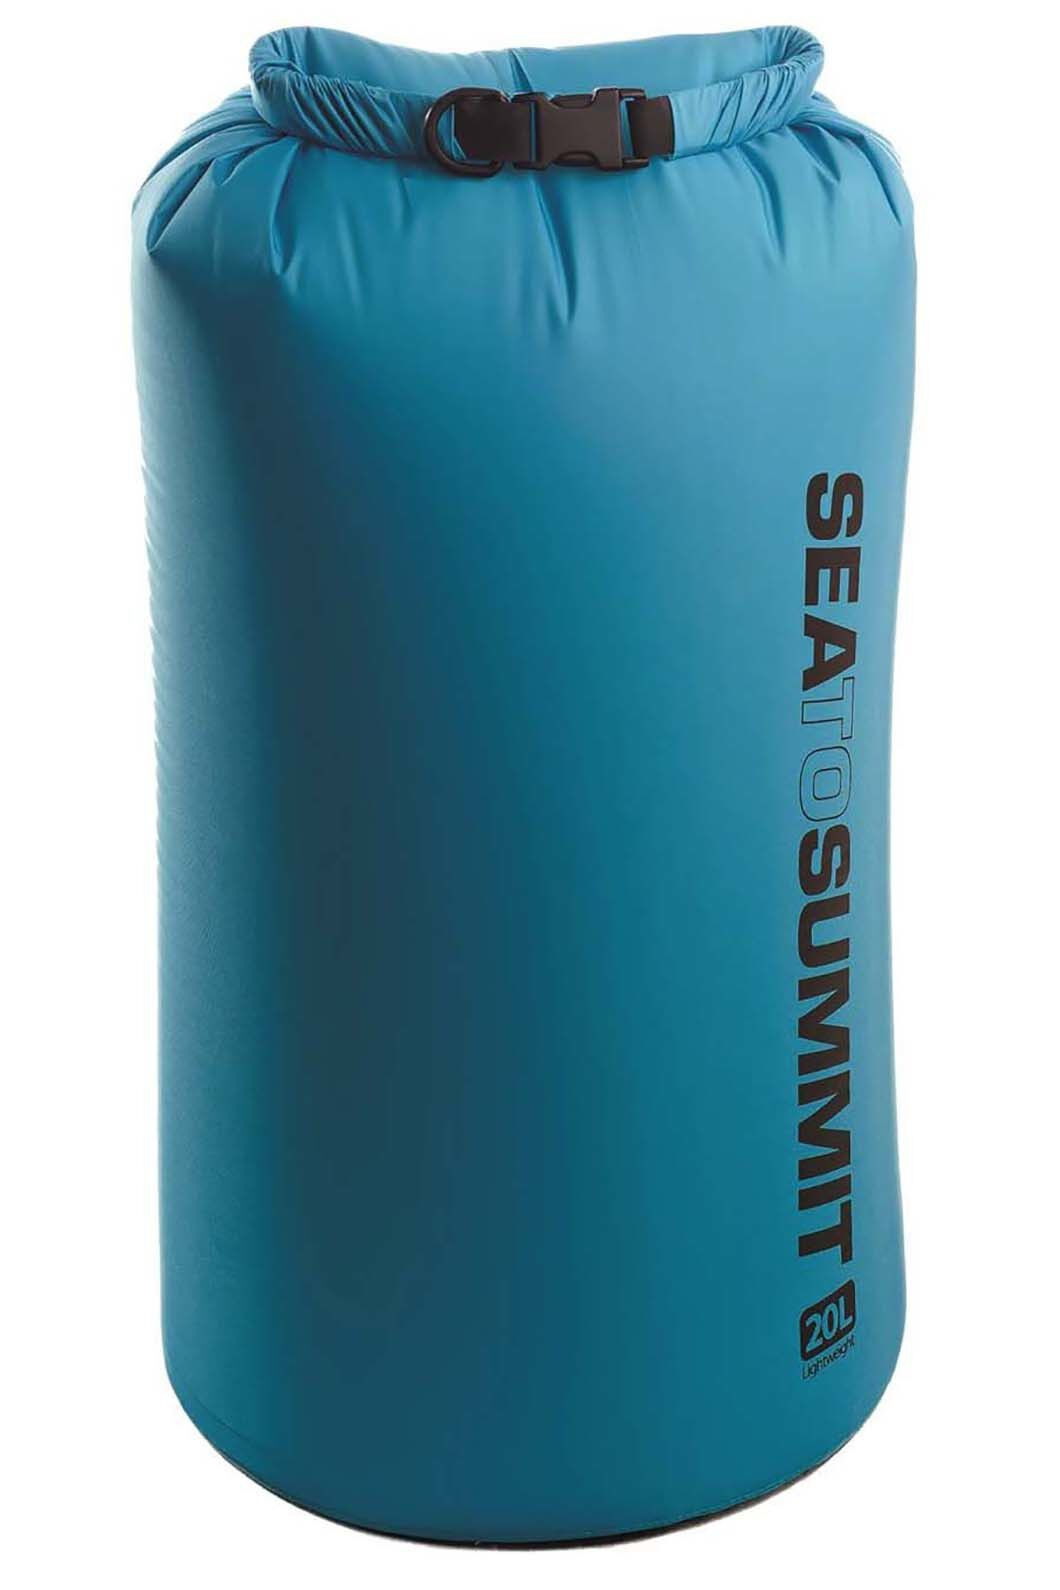 Sea to Summit 20L Light Dry Sack, None, hi-res